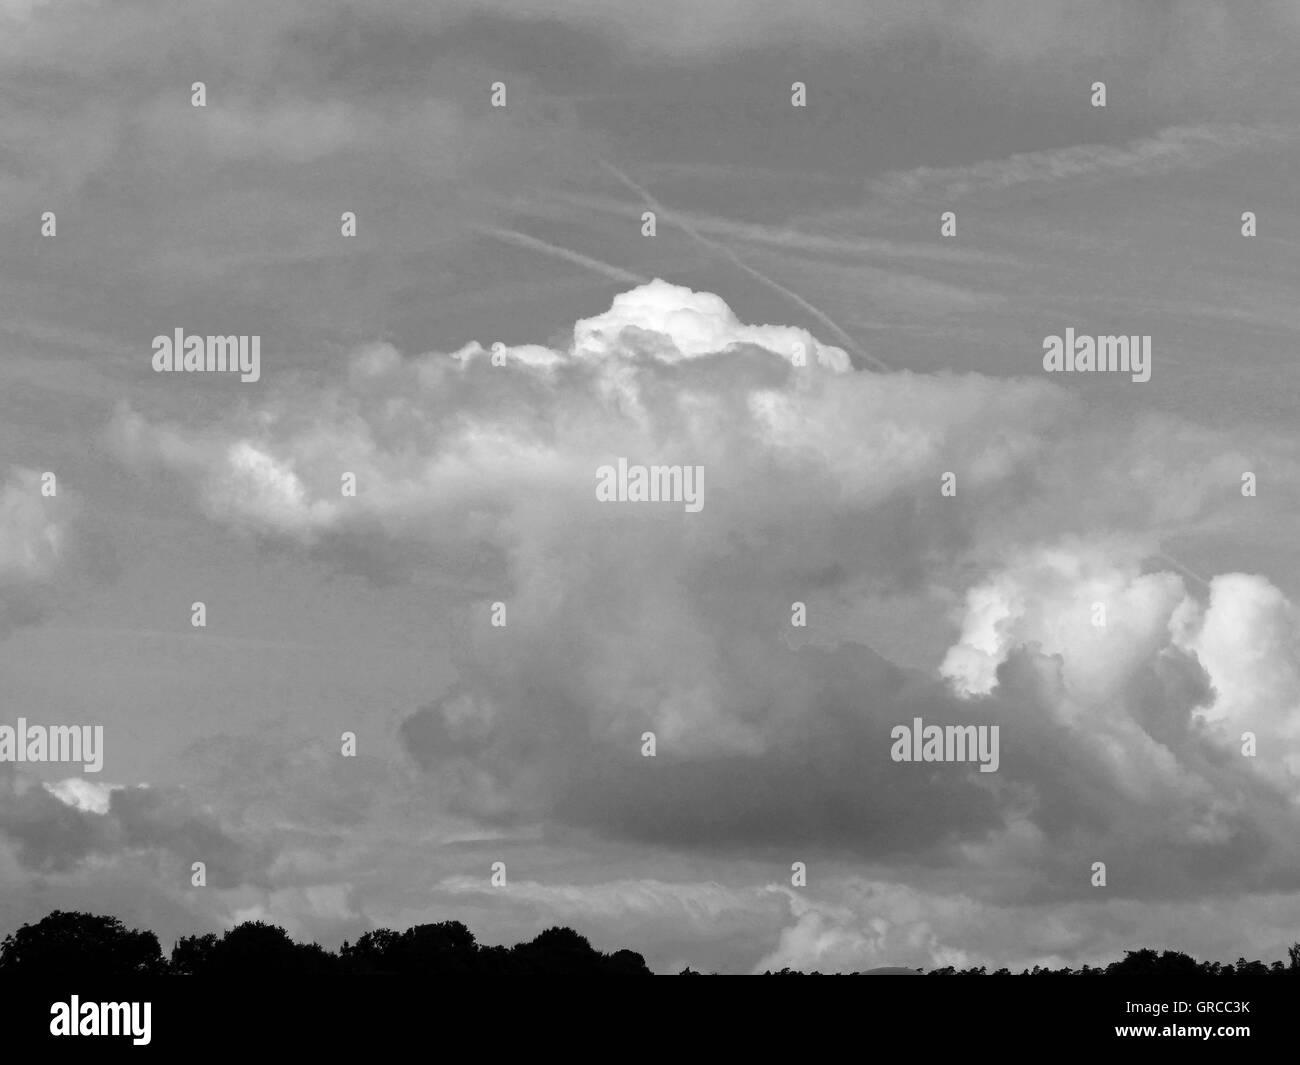 Clouds, Cumulonimbus - Stock Image